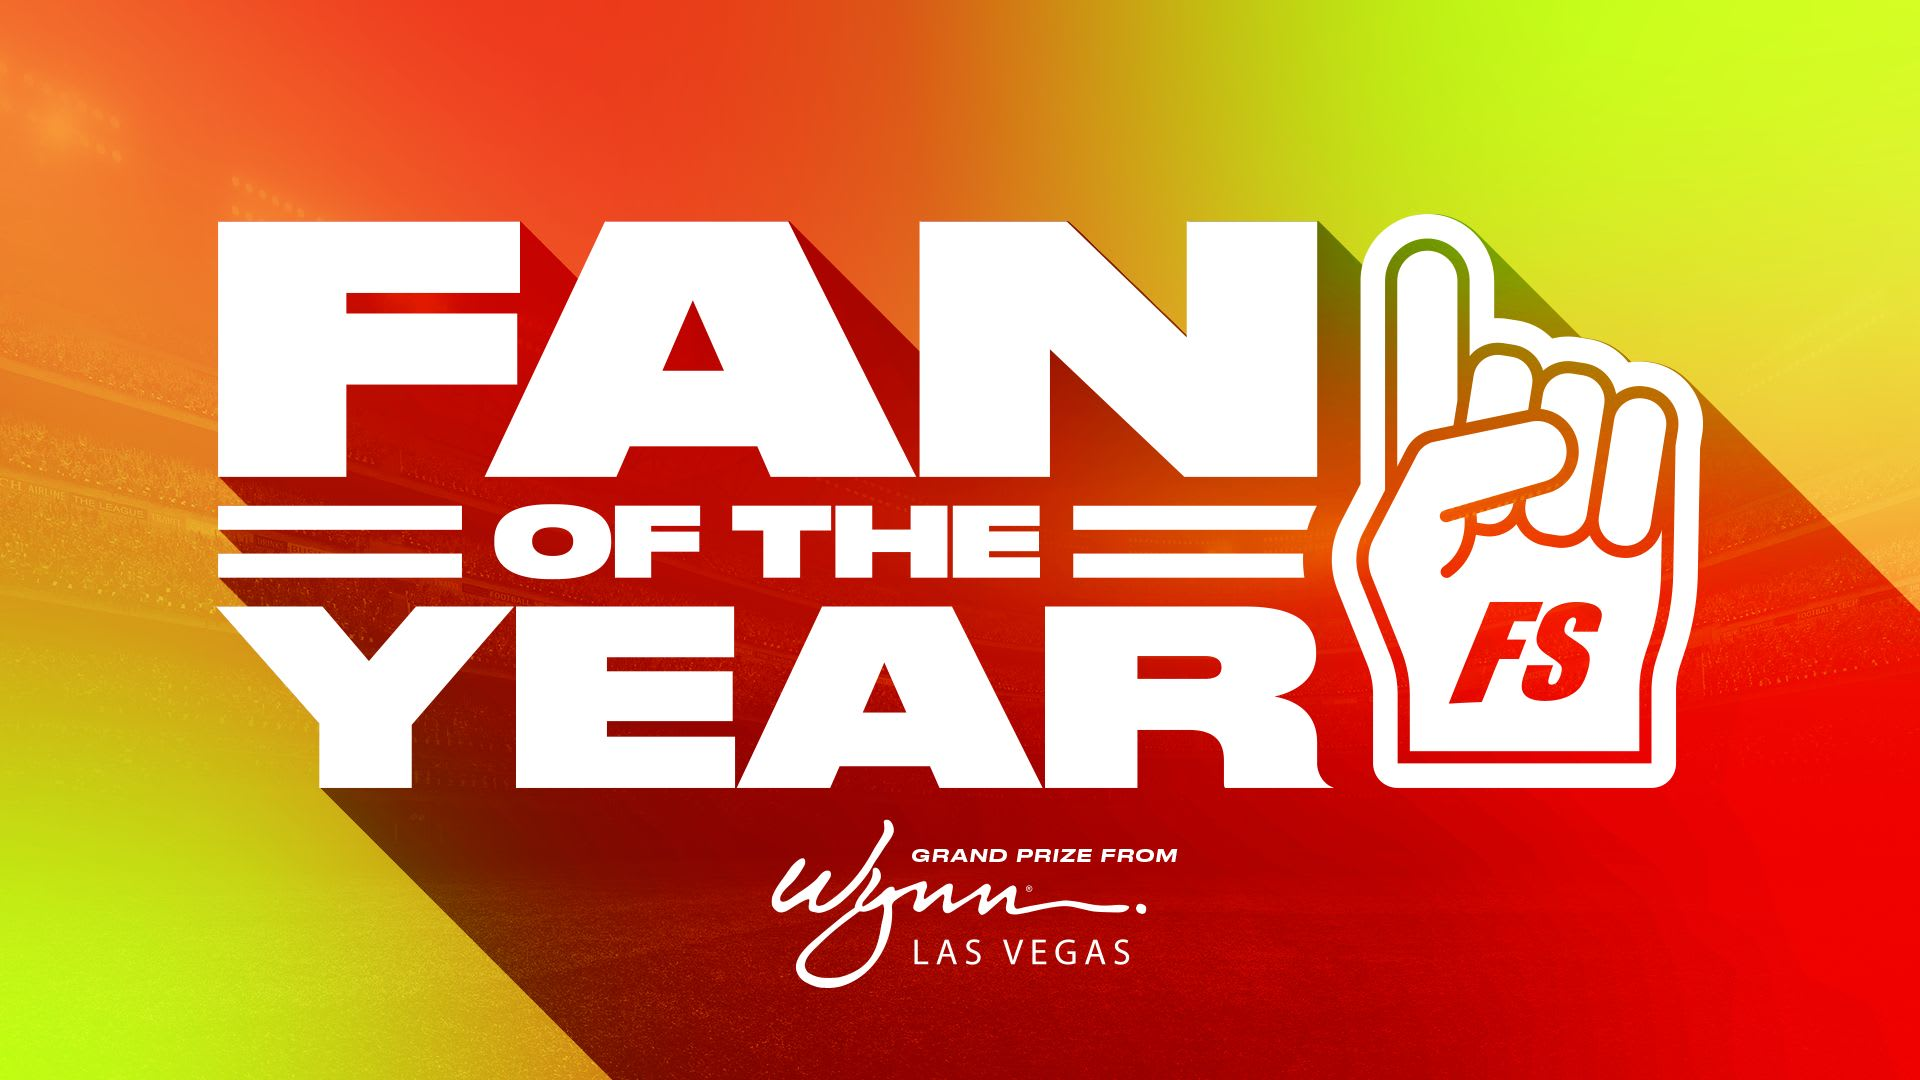 https%3A%2F%2Ffansided.com%2Ffiles%2F2021%2F10%2F2021 Fan of the Year Twitter